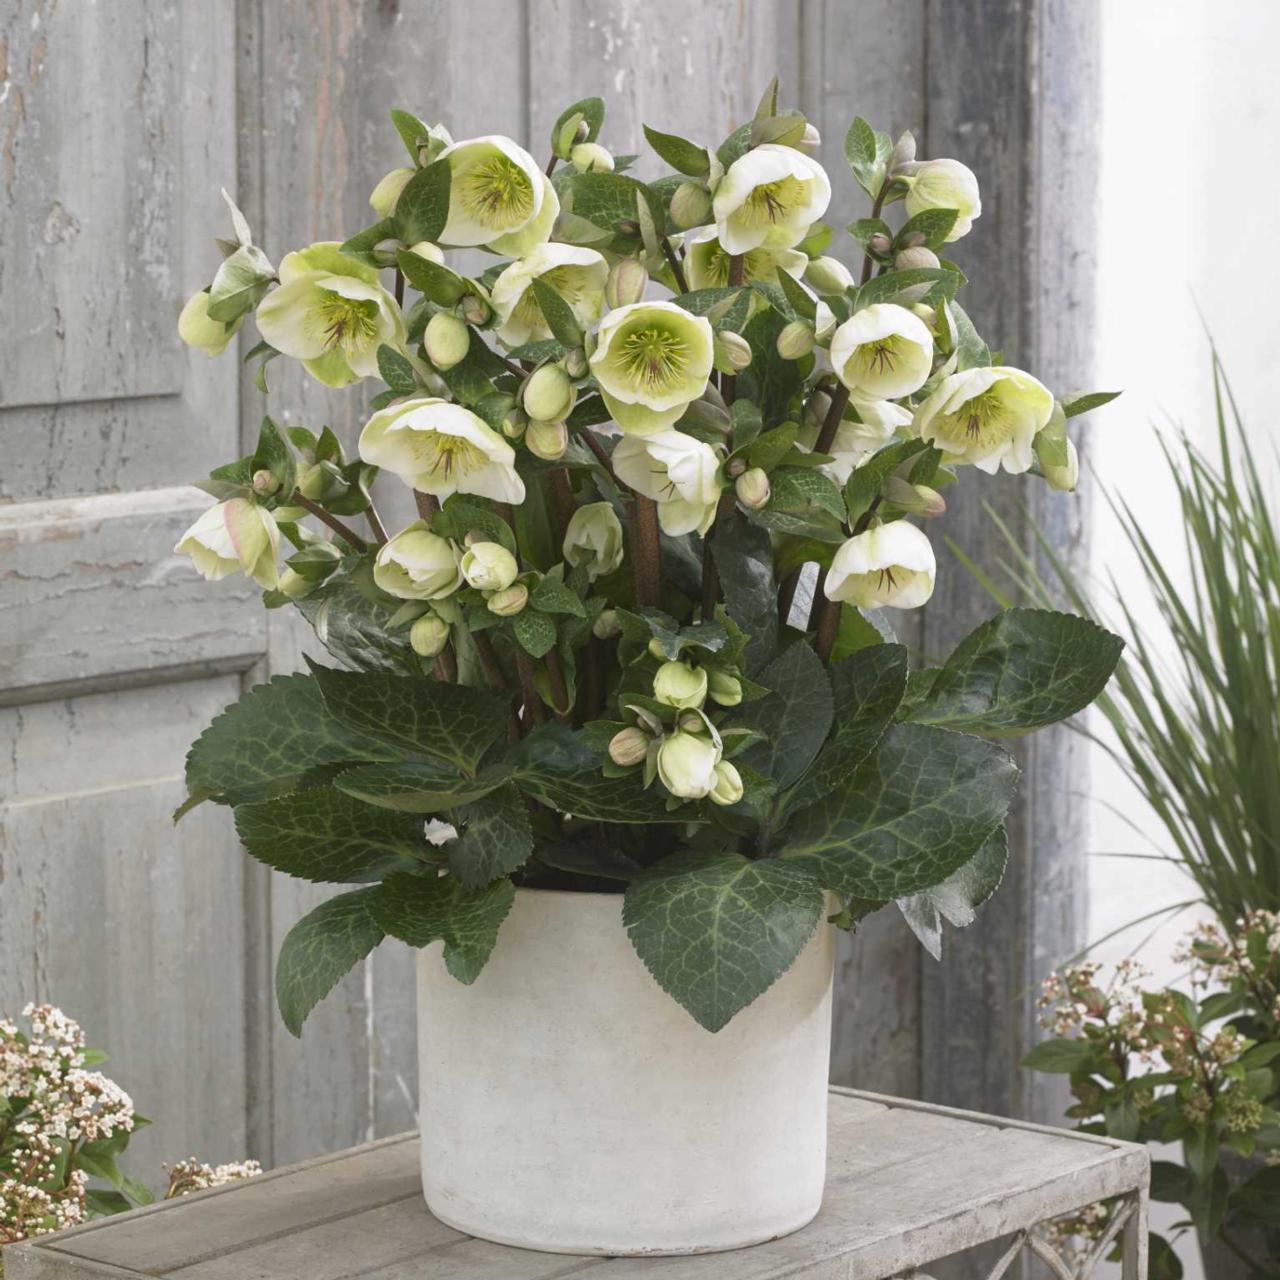 Helleborus 'Moondance' plant